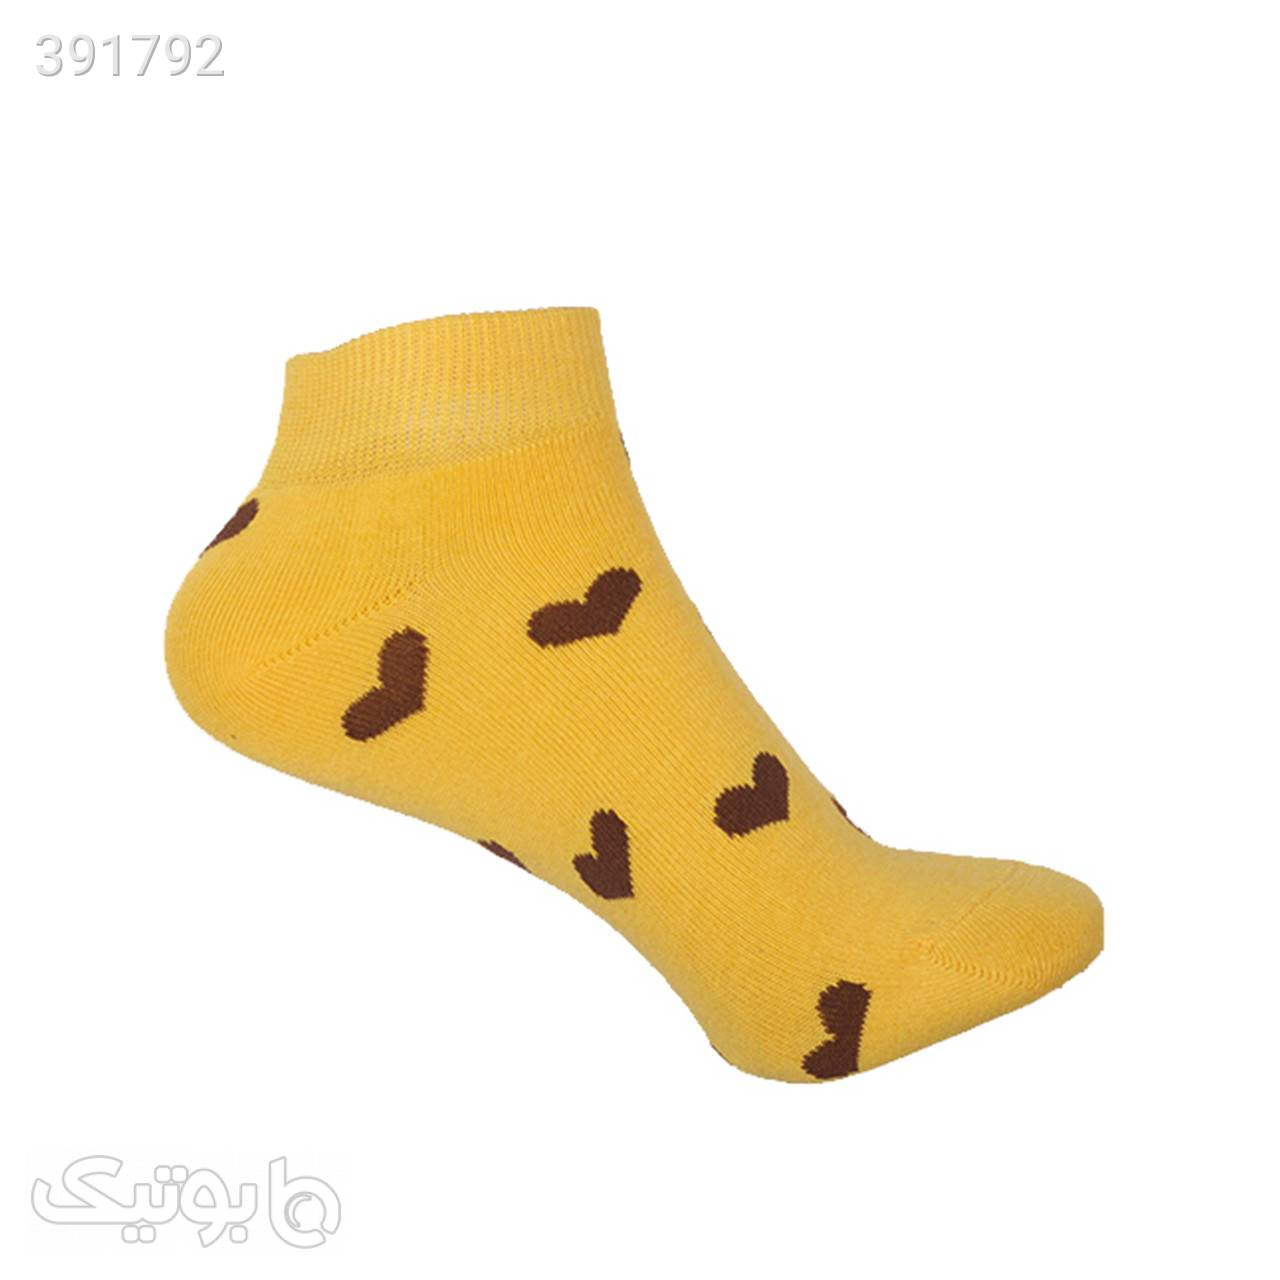 جوراب آنتی باکتریال زنانه مدل 0946-1097 زرد جوراب و پاپوش